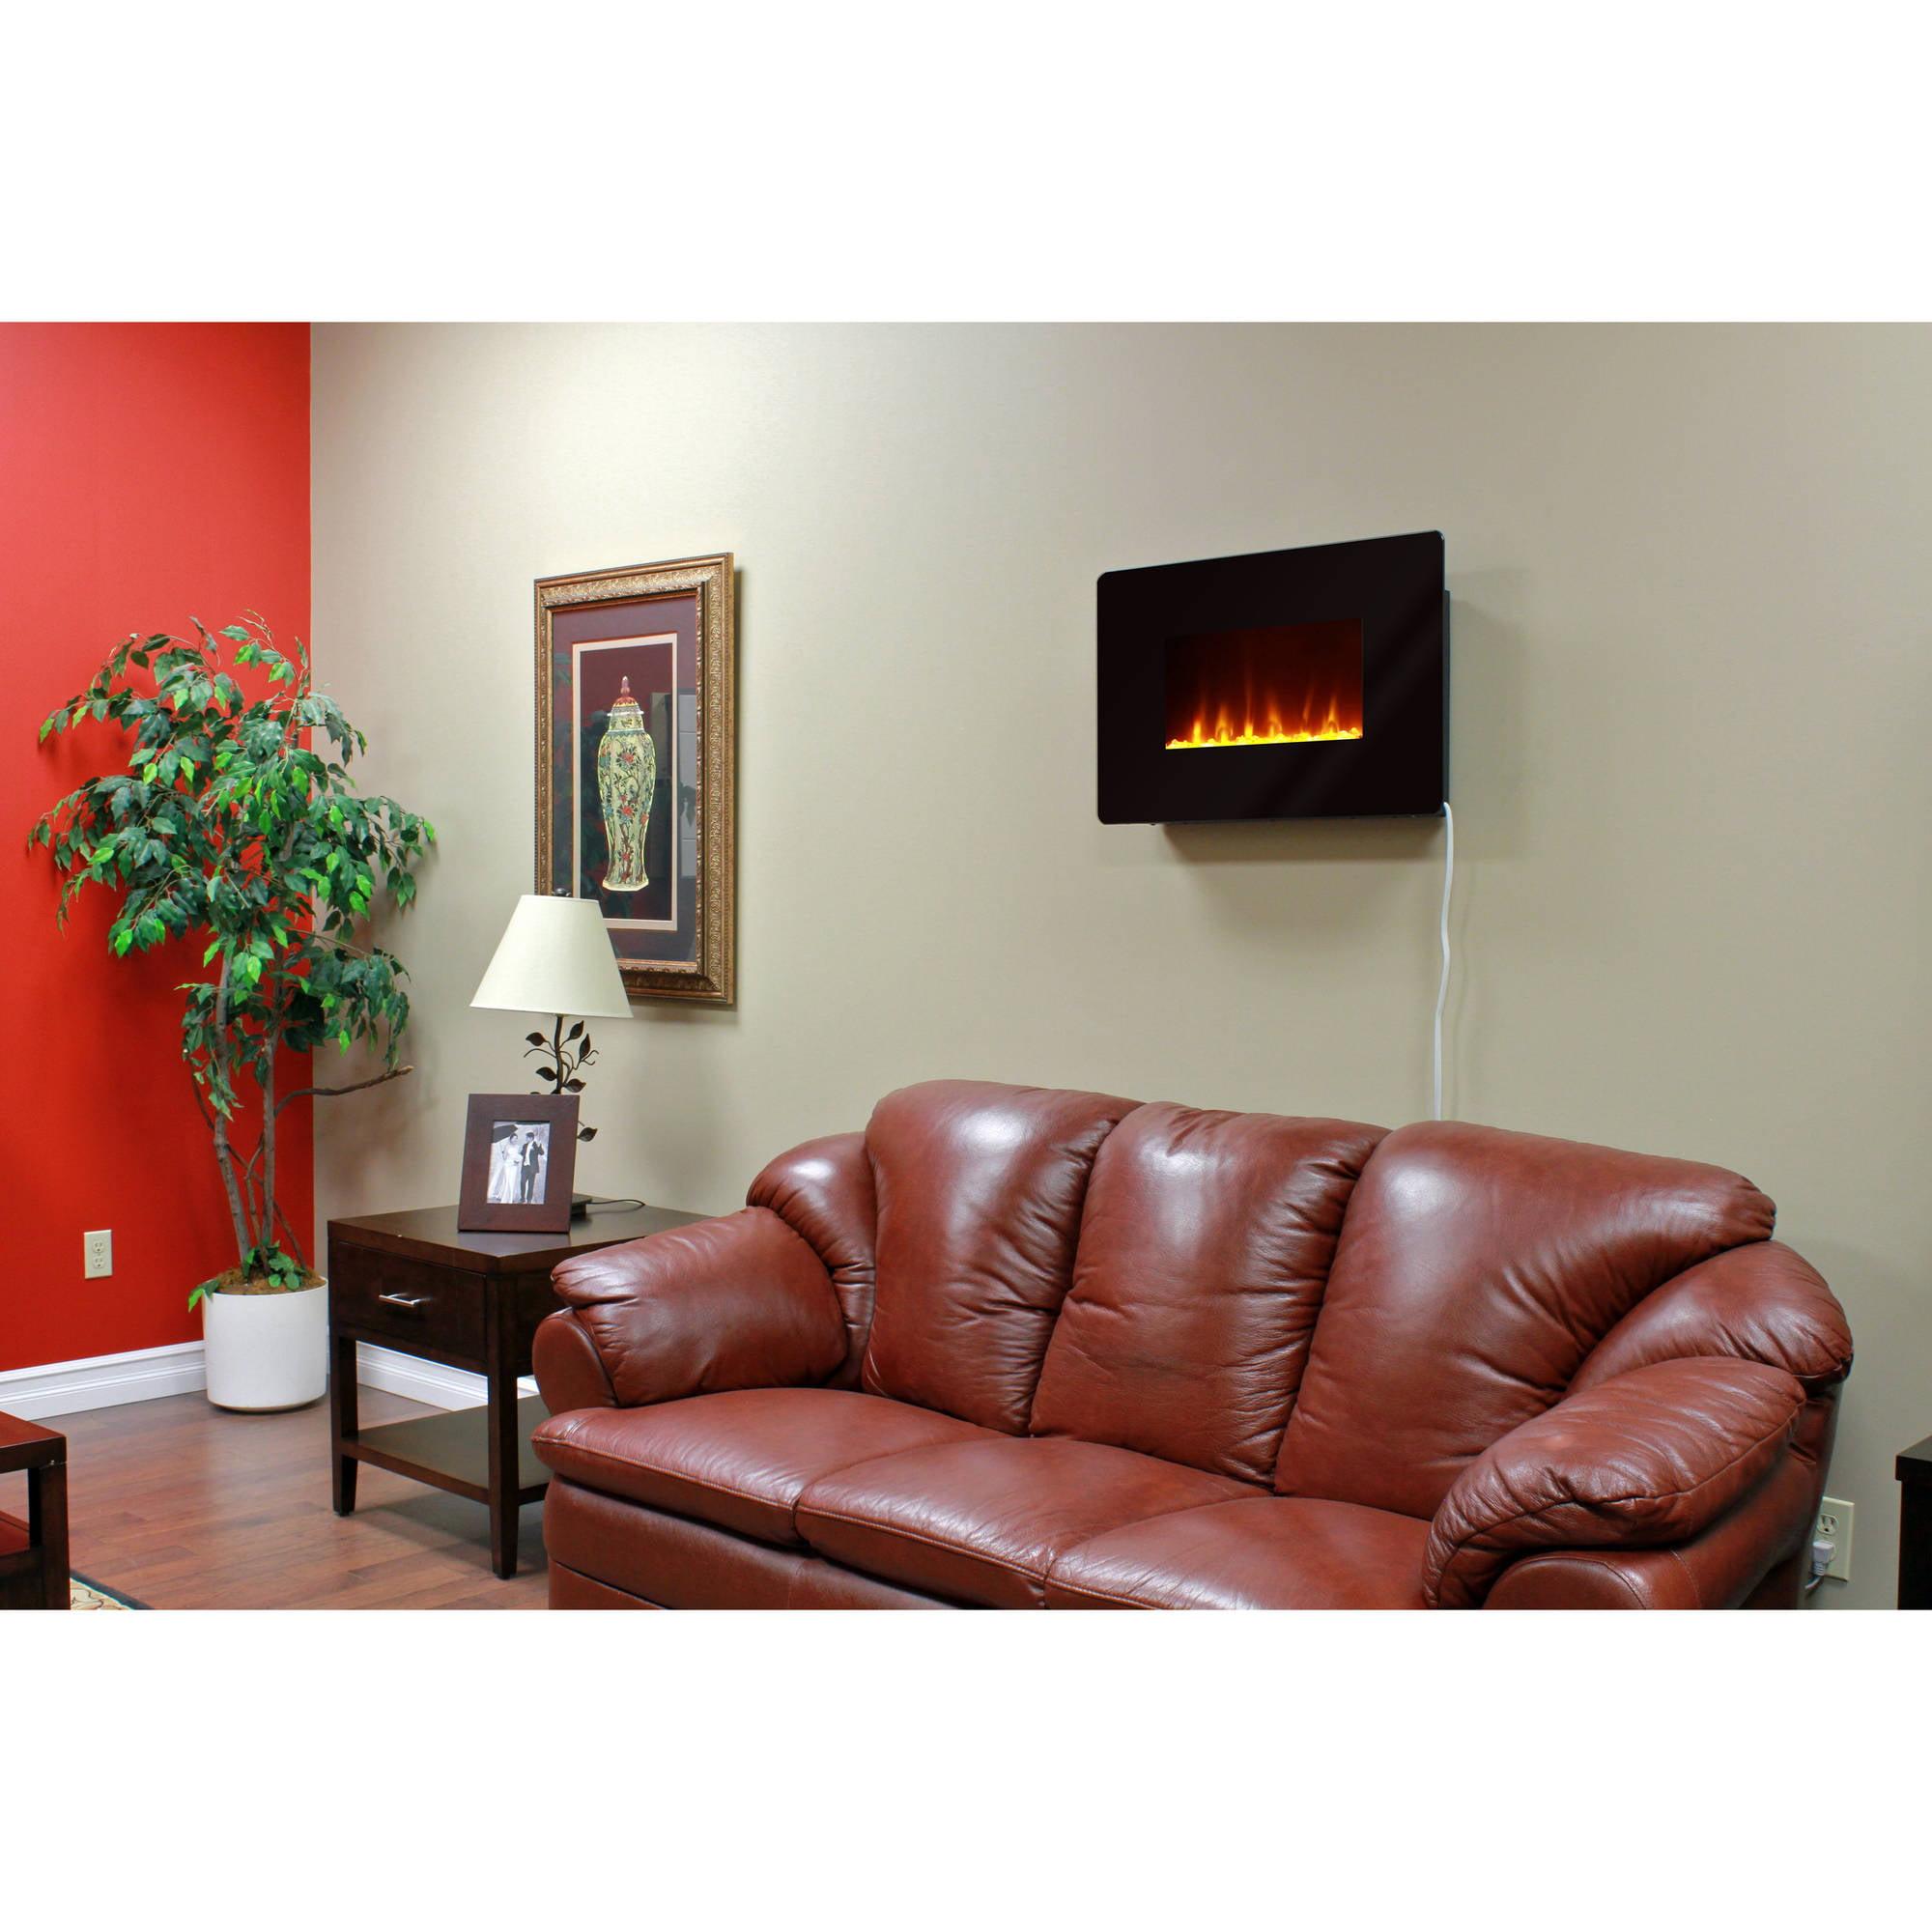 muskoka mh25bl corrida wall mount fireplace walmart com